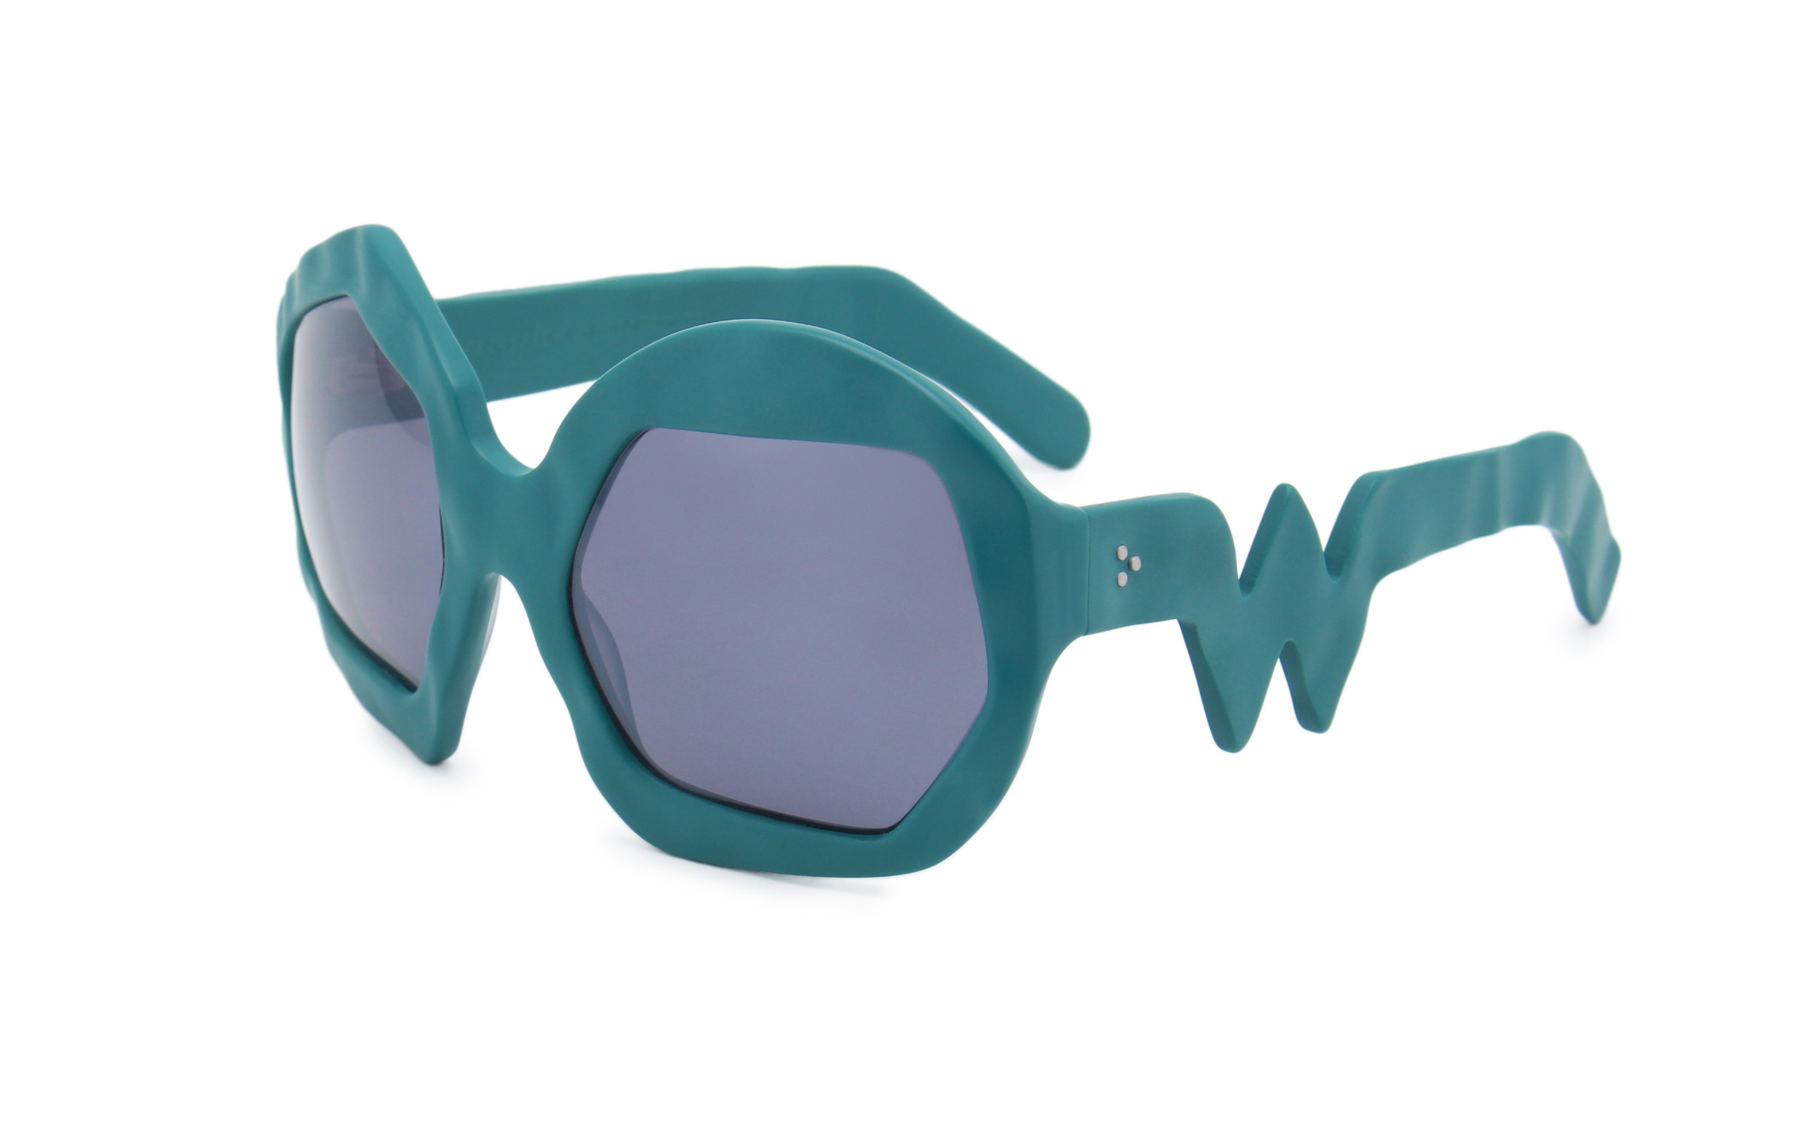 FAKBYFAK x Walter Van Beirendonck  Thunder Sunglasses. Petrol Green Code: FBF-09-12-05